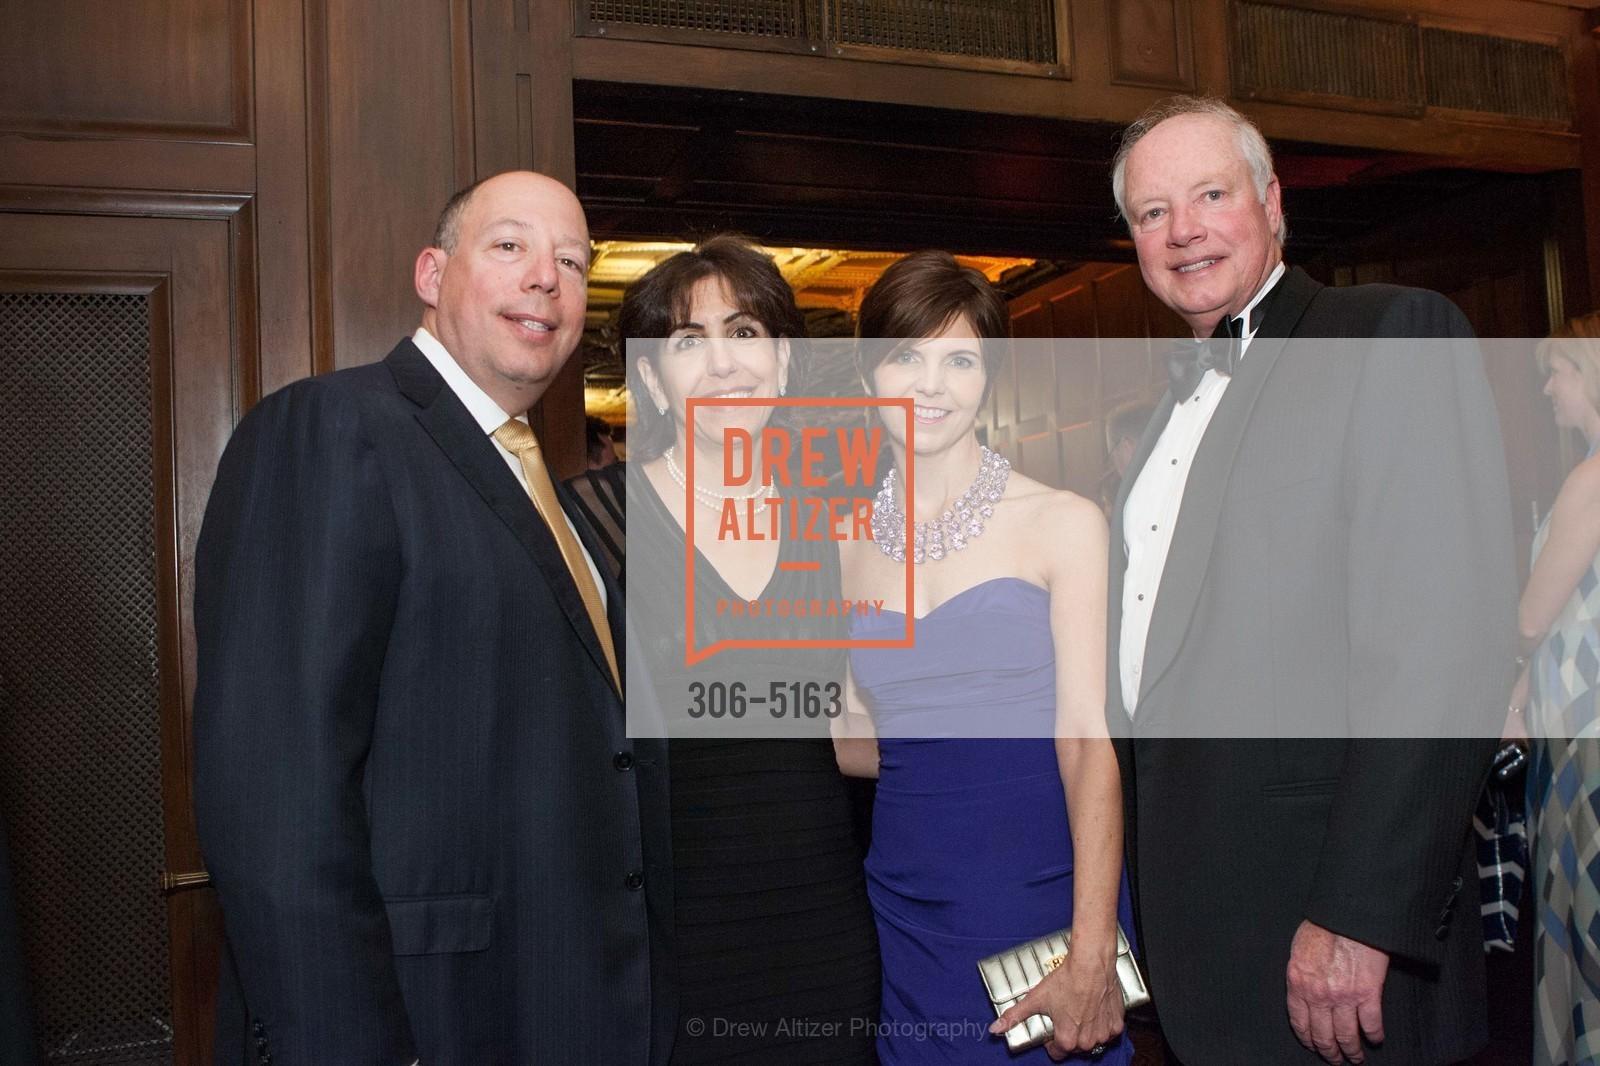 Peter Rosenthal, Patty Rosenthal, Marguerite Feist, Don Feist, Photo #306-5163